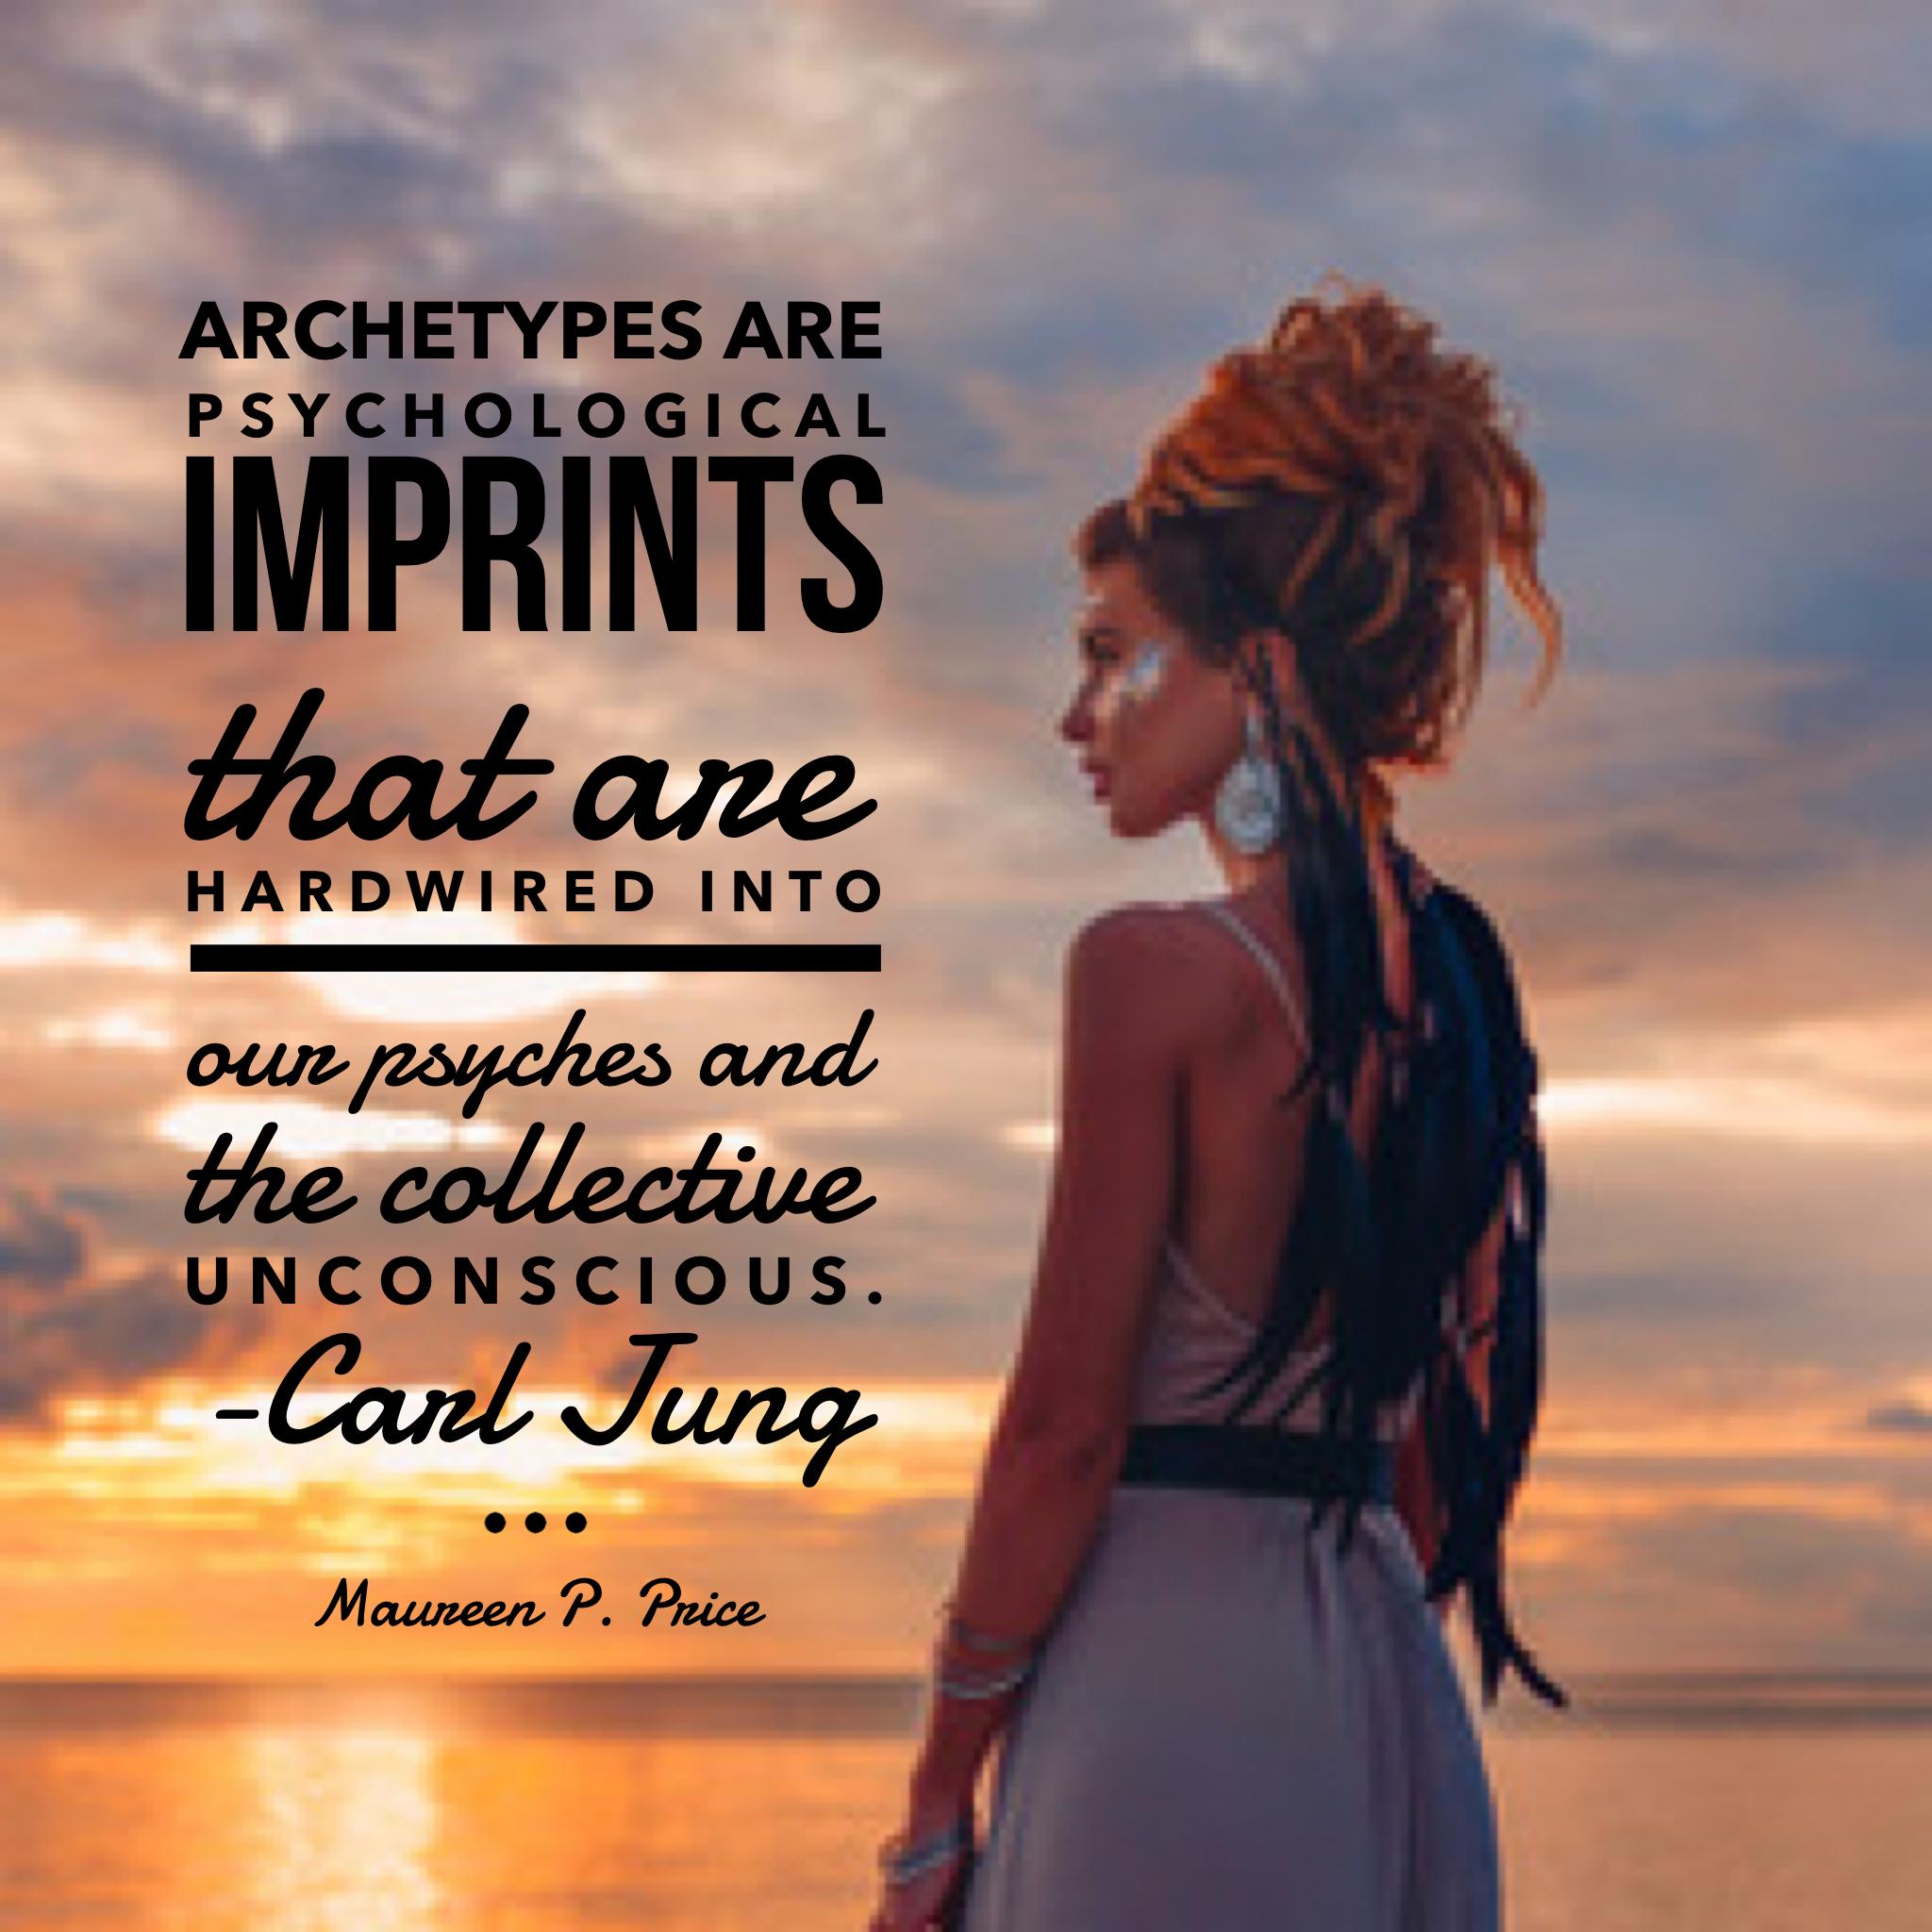 archetypes are psychological imprints